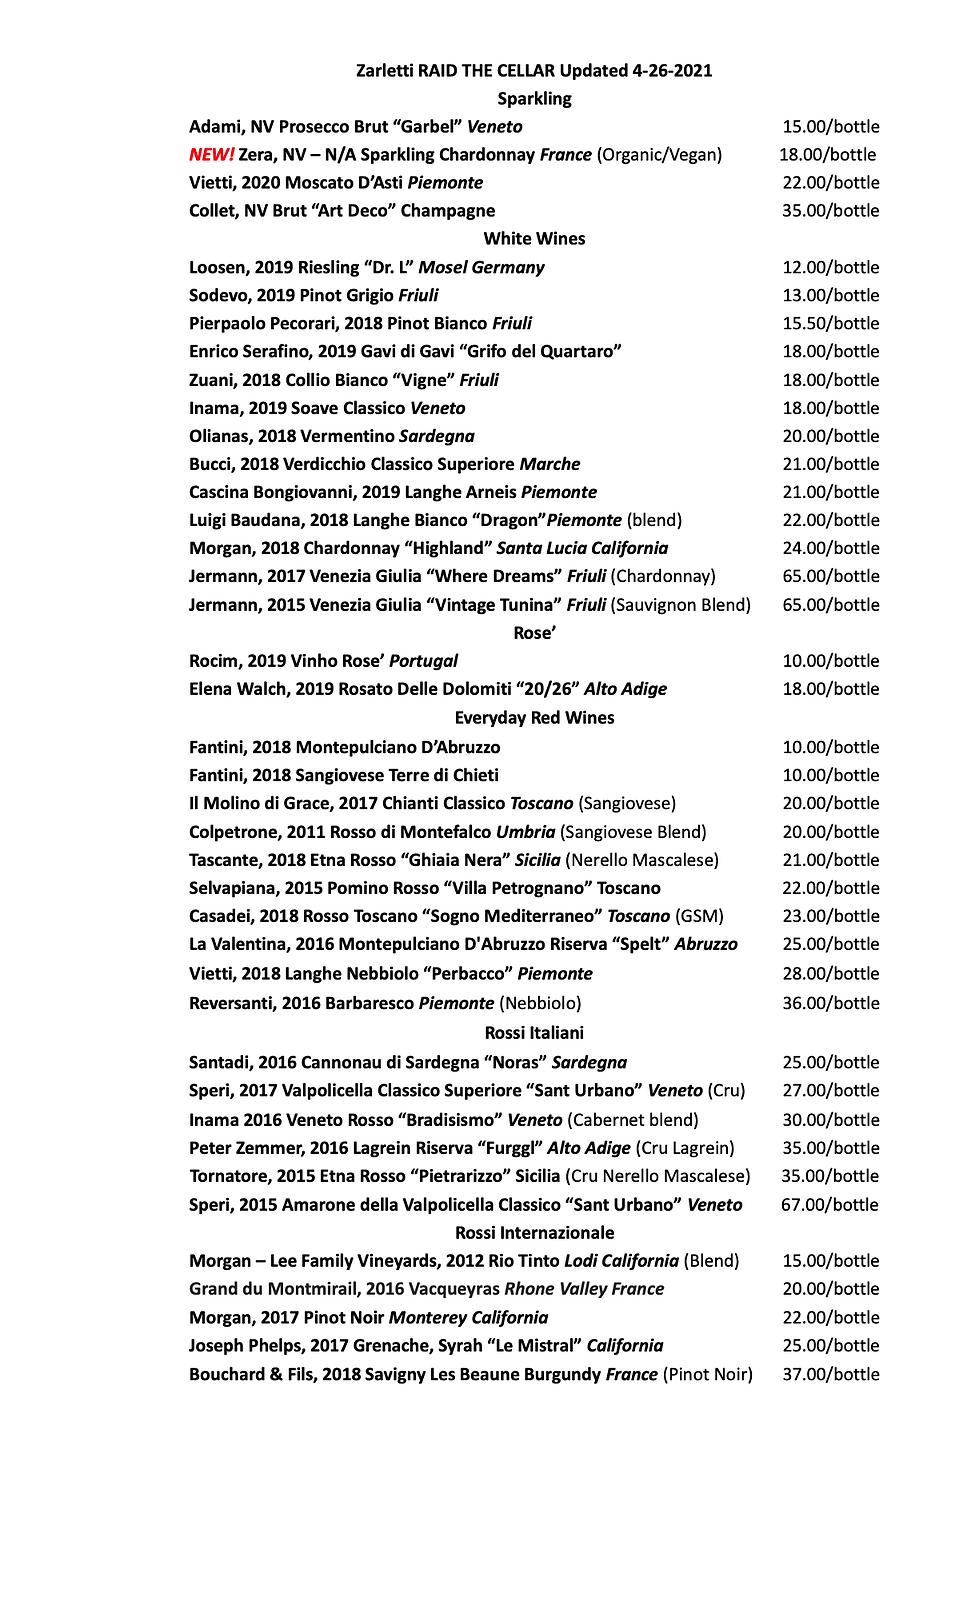 Page 1 RTC list-1 (dragged).tiff